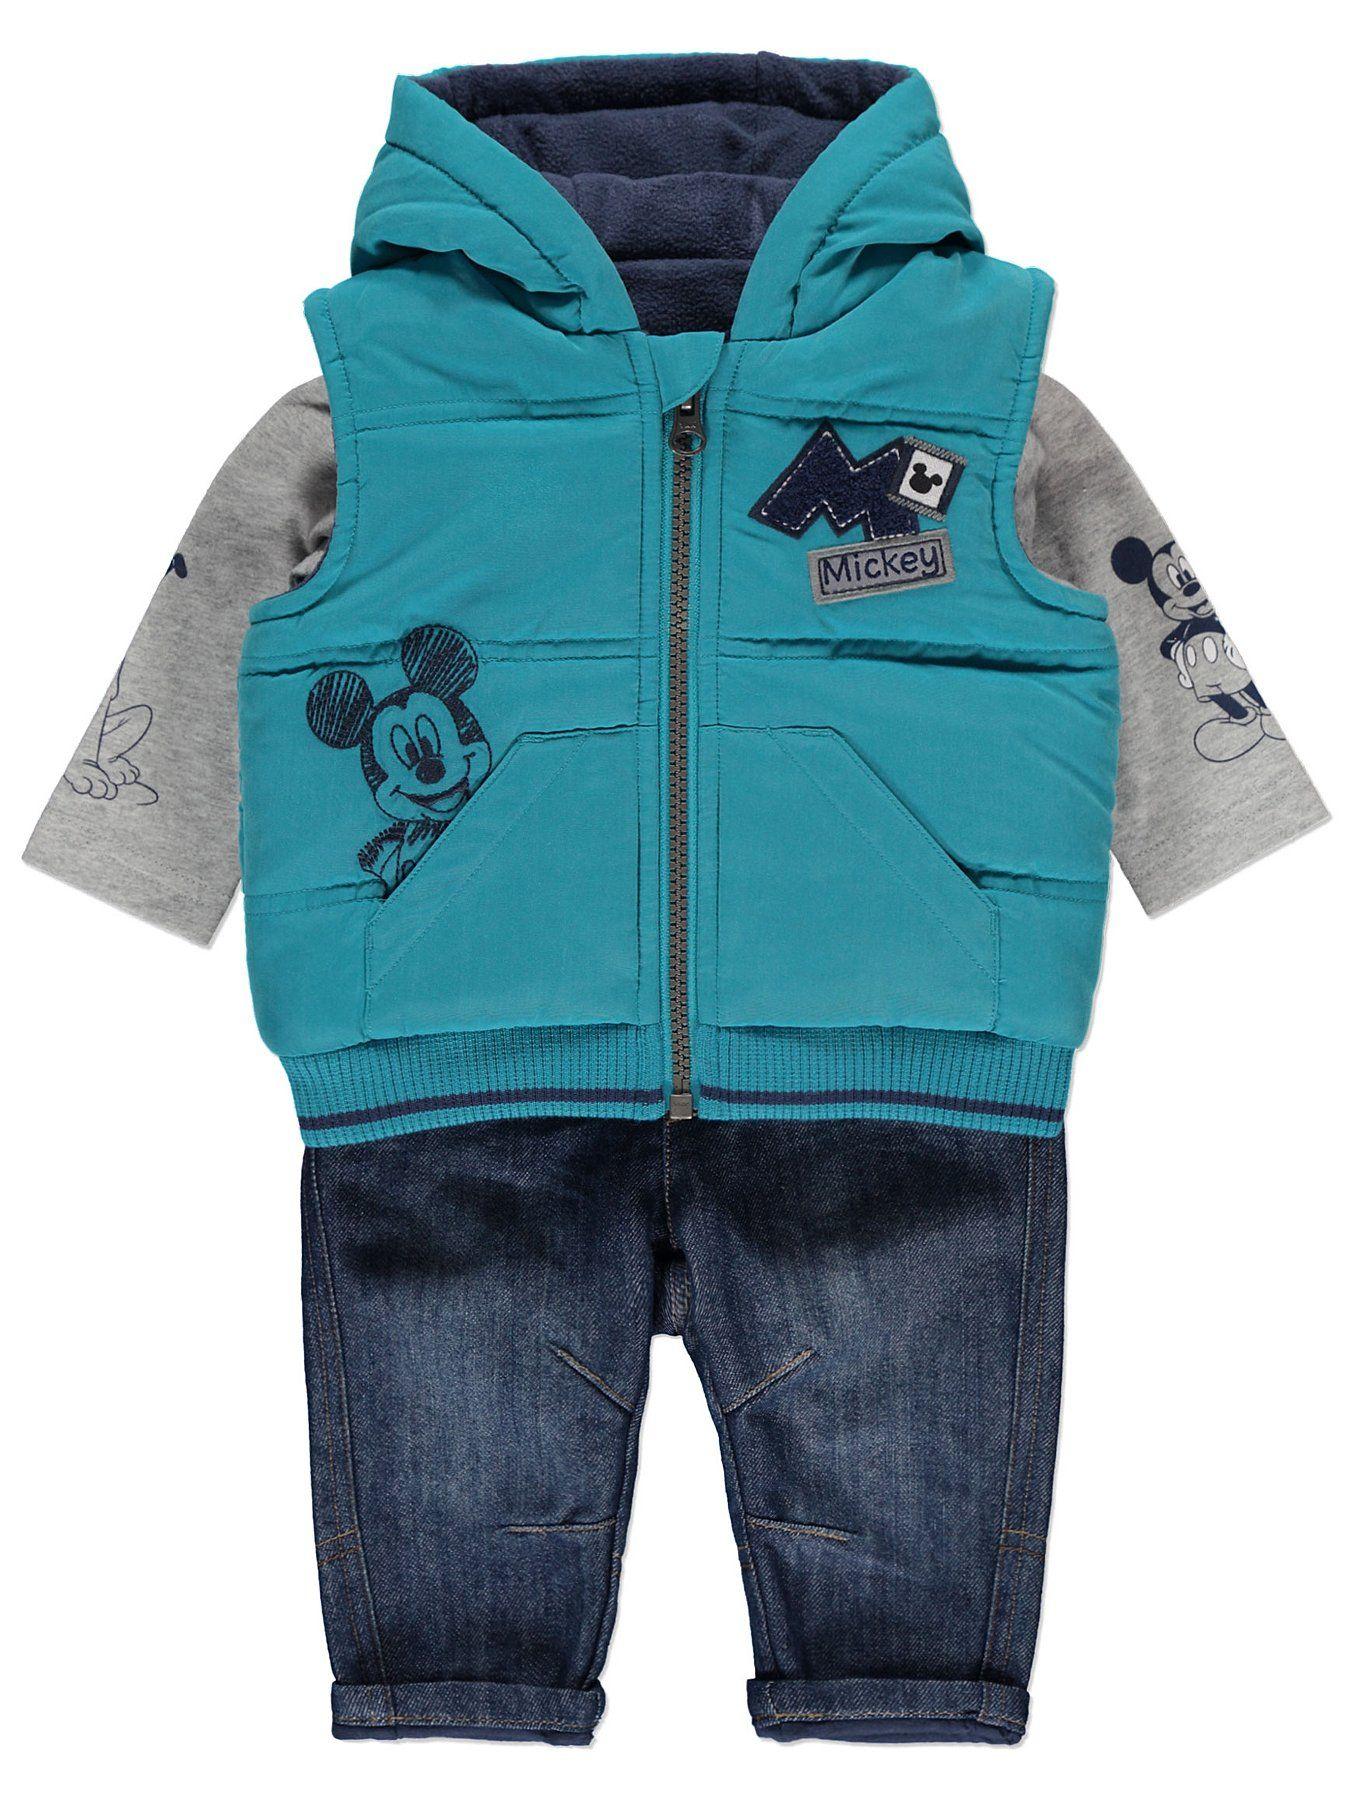 Newborn Baby Boys Dinosaur 3 Piece Fleece Lined Gilet Top /& Trousers Outfit